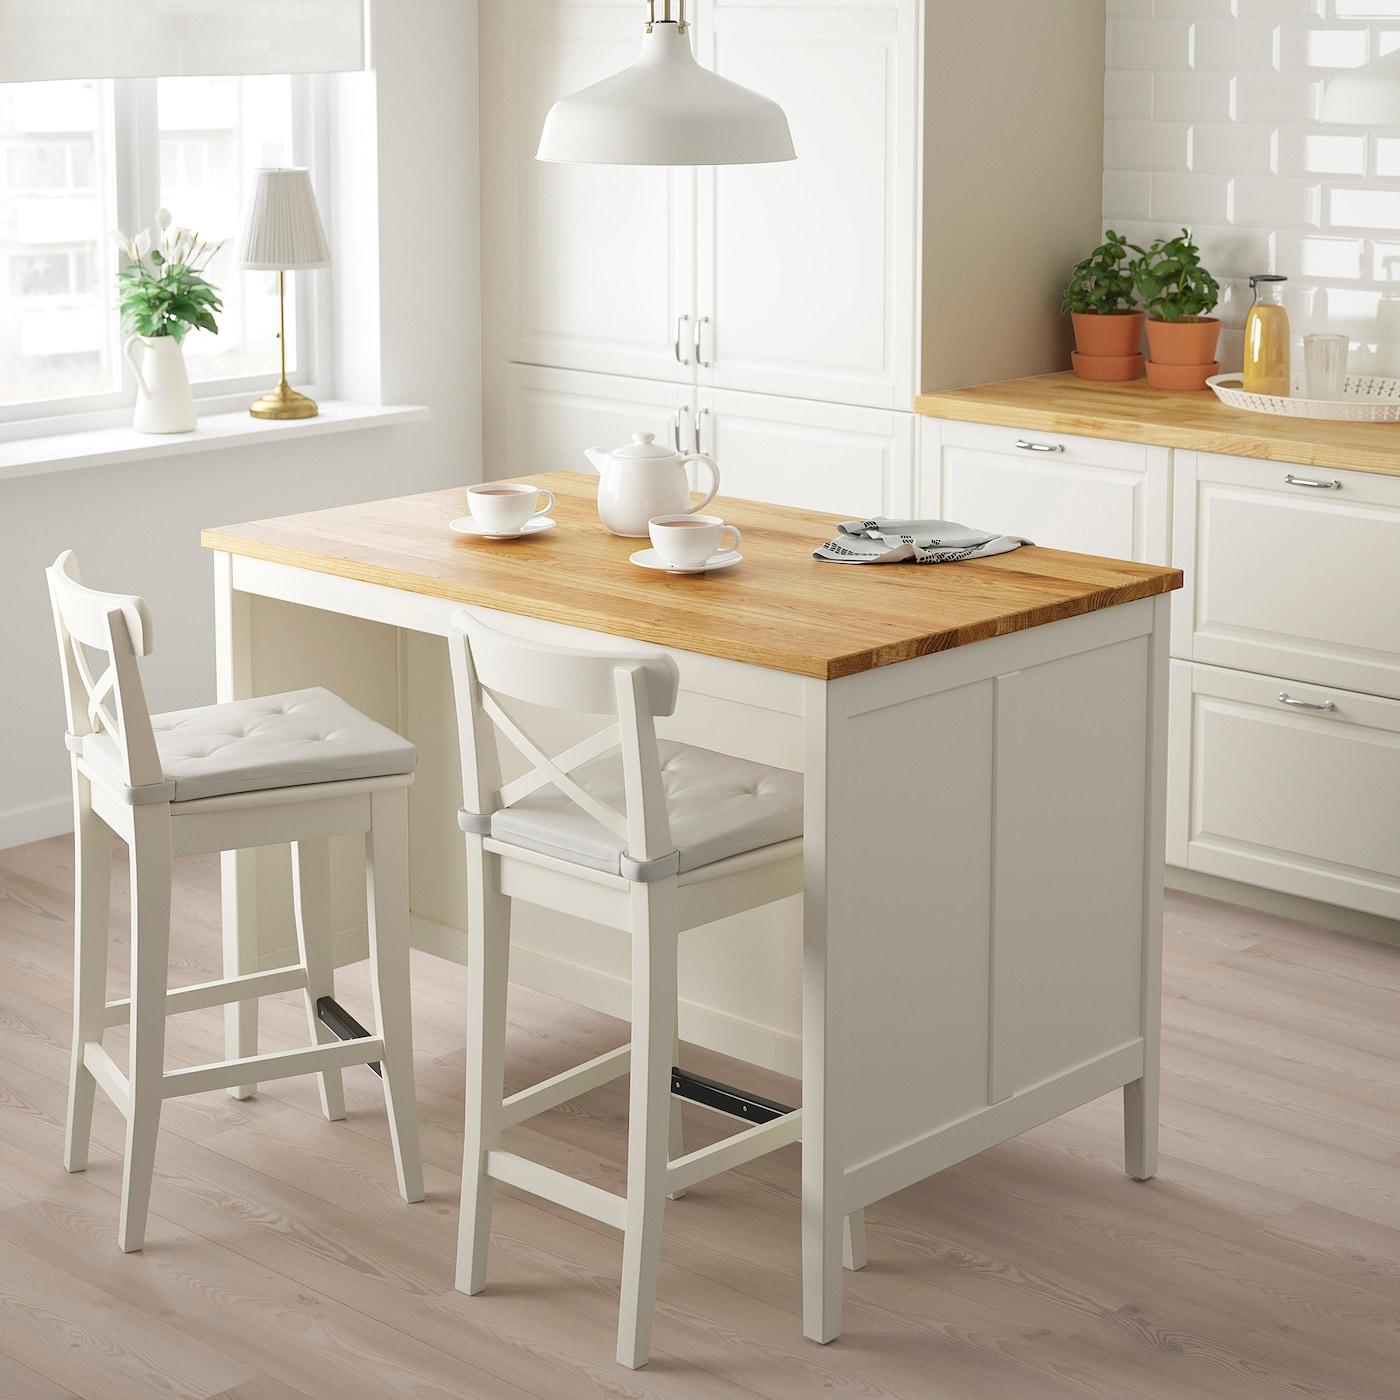 Tornviken Kitchen Island Off White Oak Length 49 5 8 Ikea